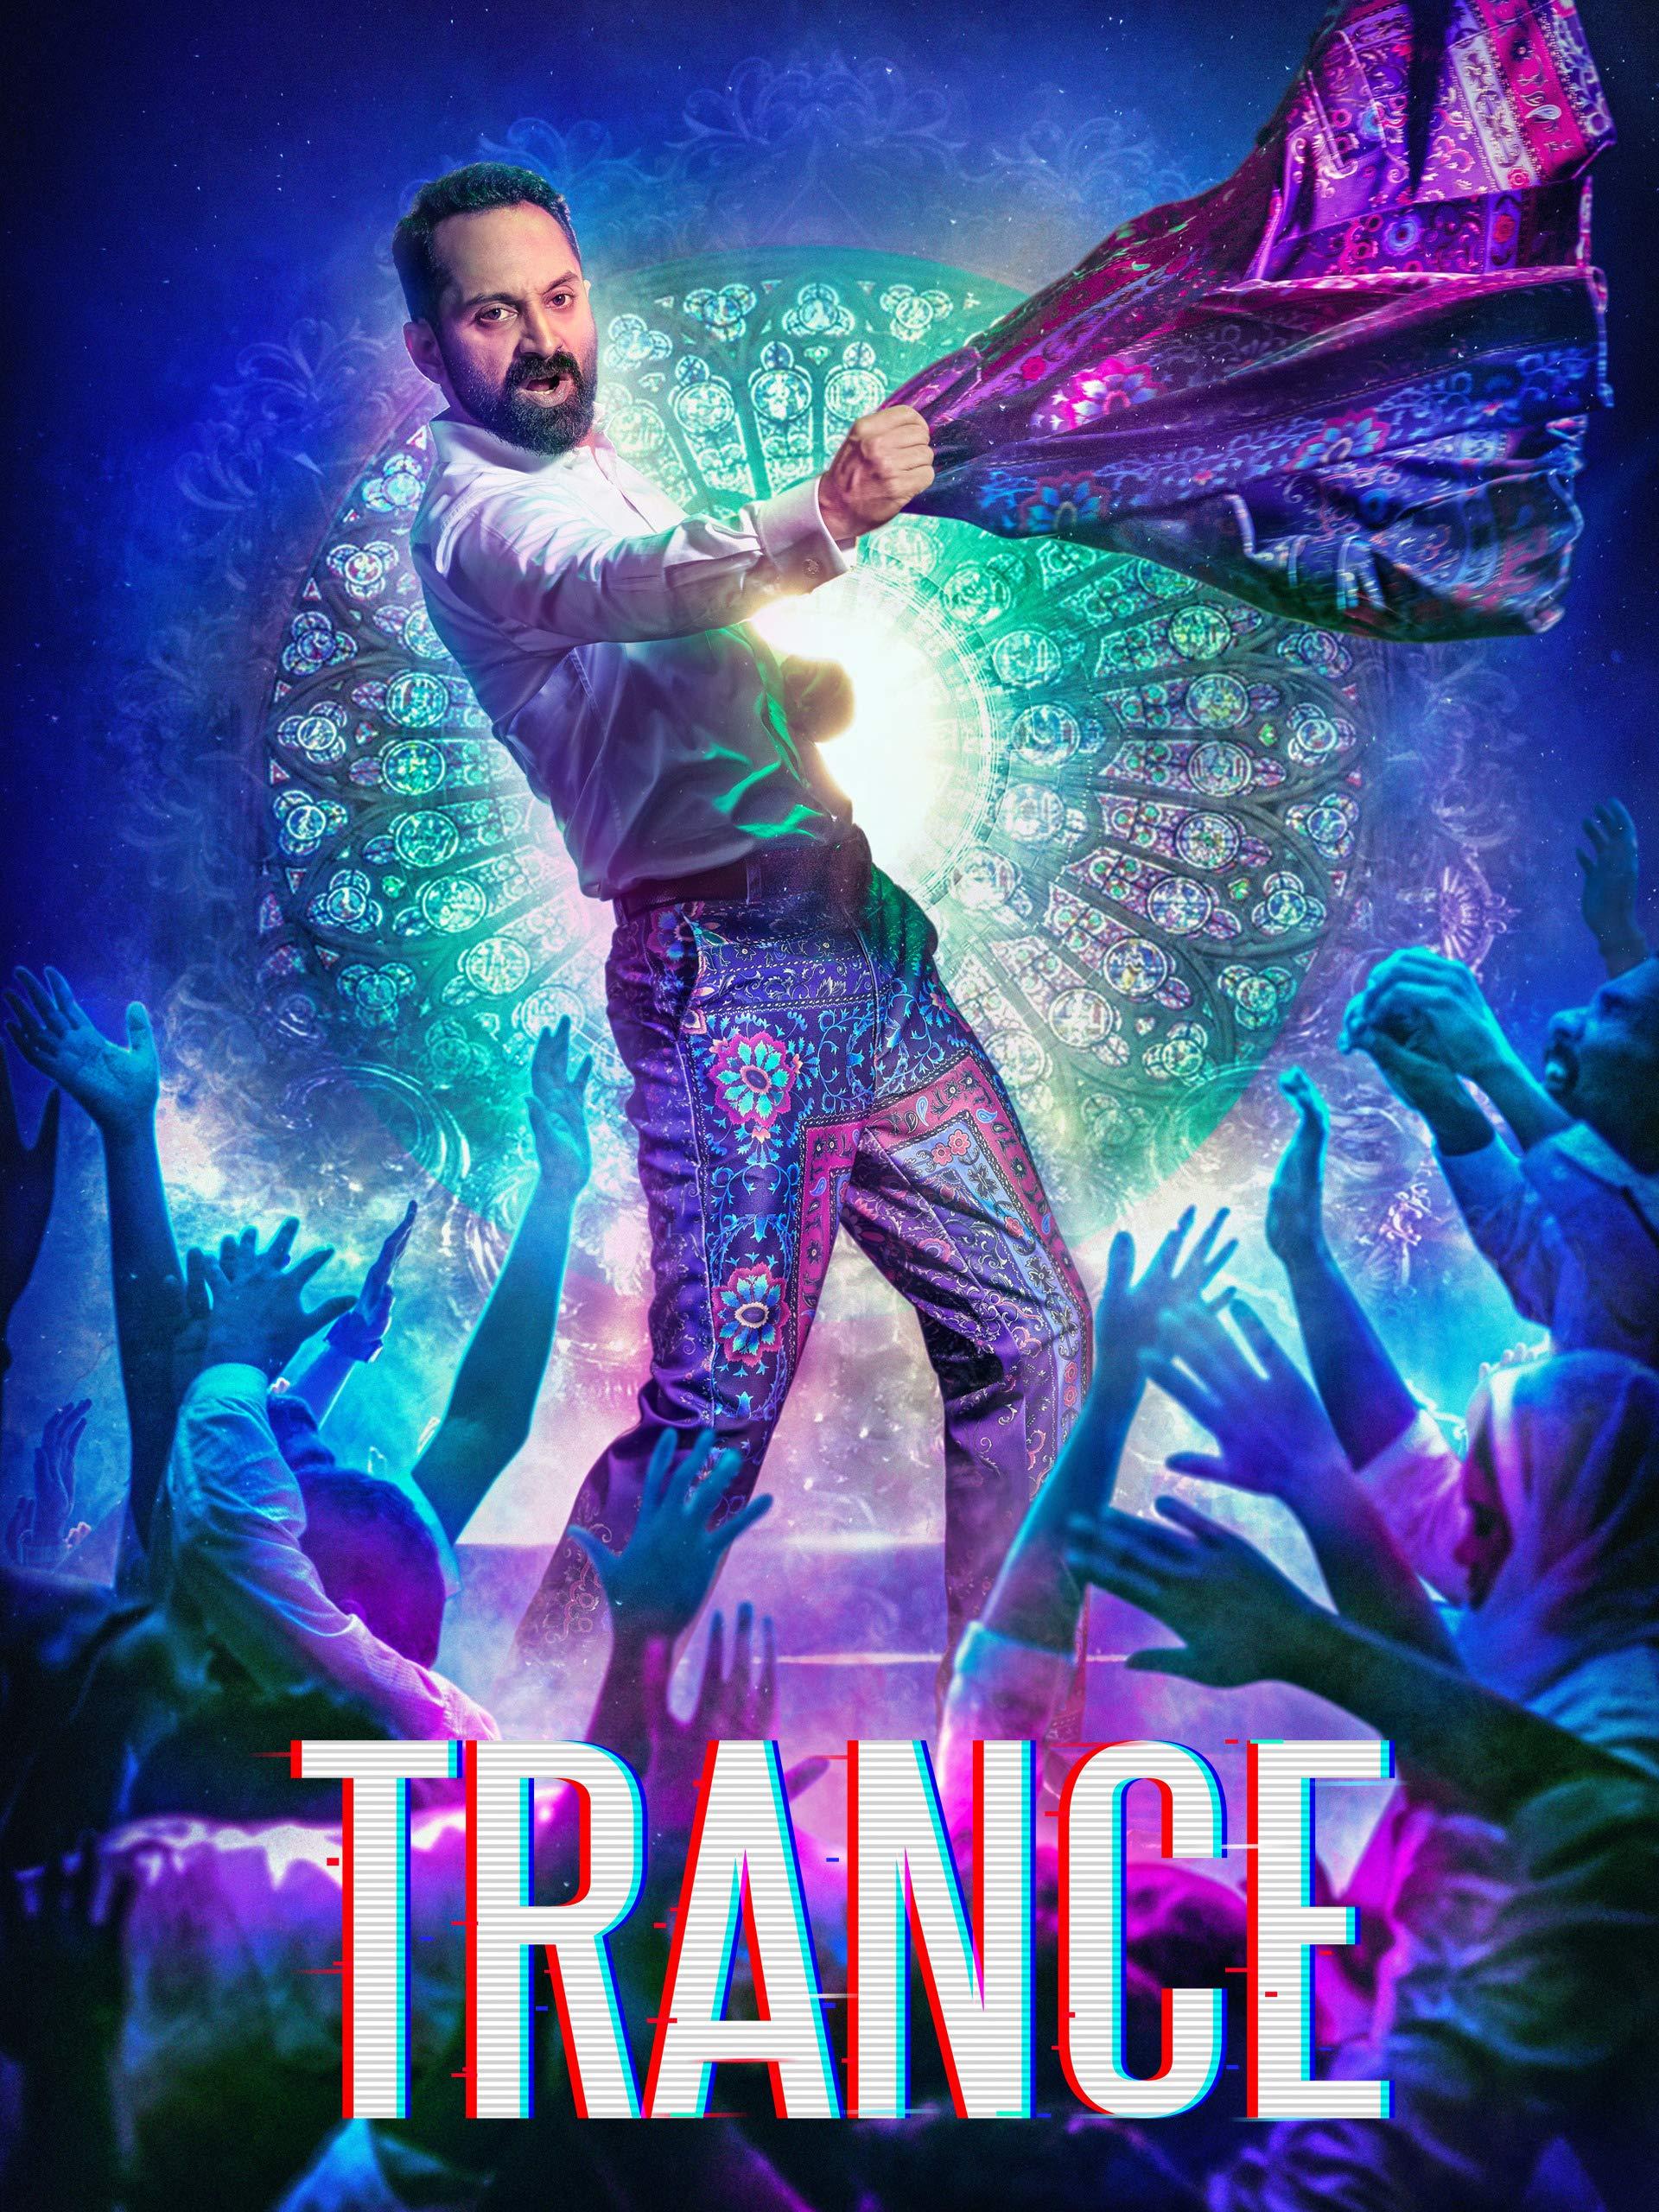 Trance (4K UHD)